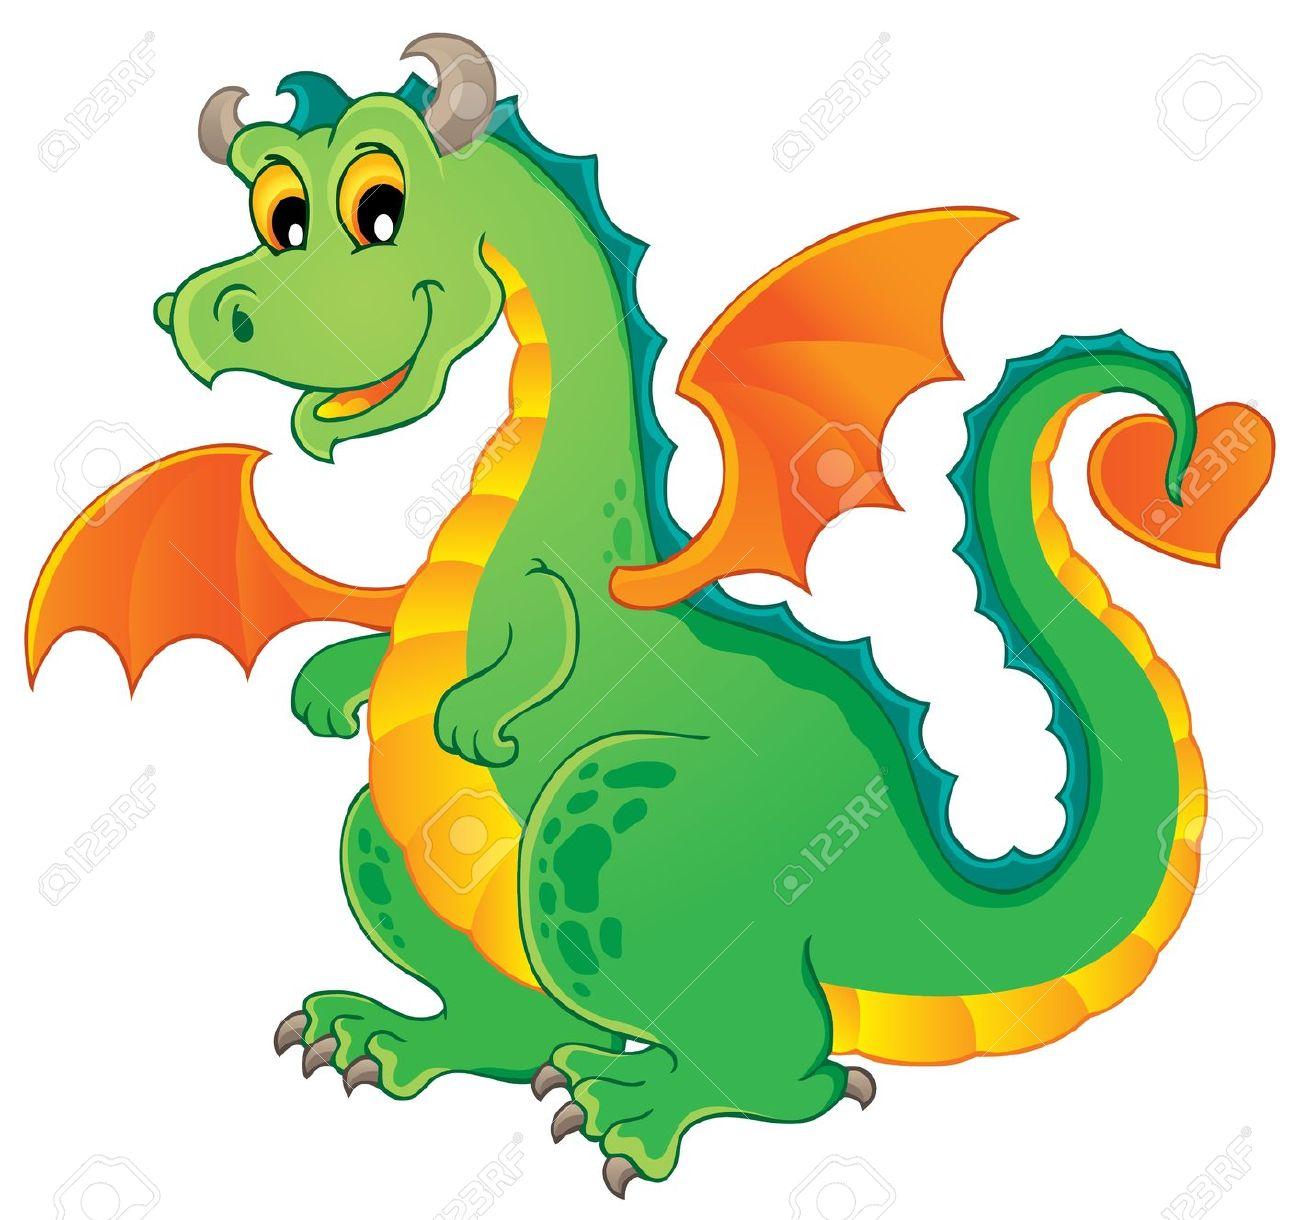 64 dragons clipart.